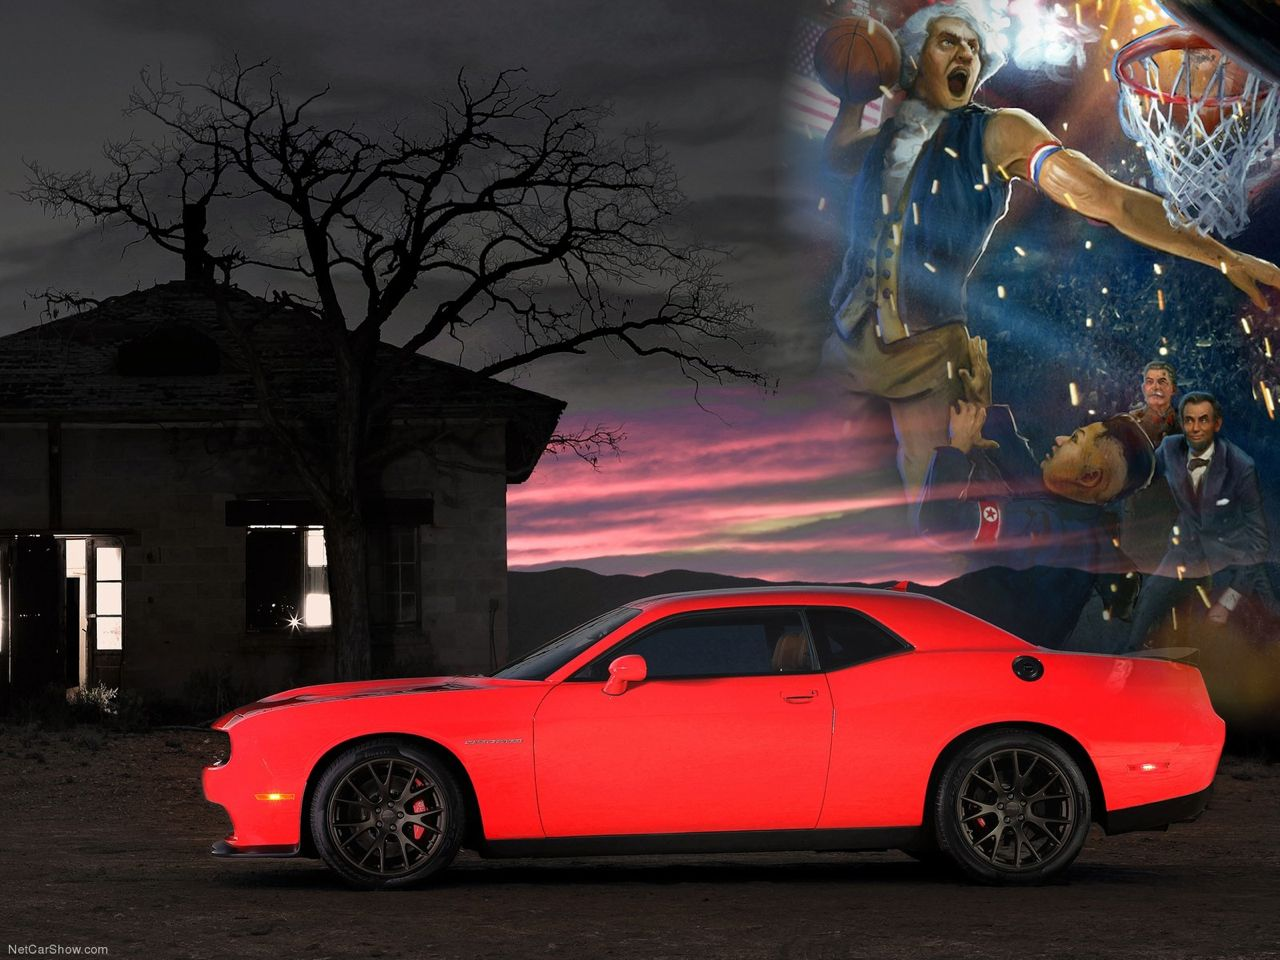 Dodge Challenger SRT Hellcat with George Washington